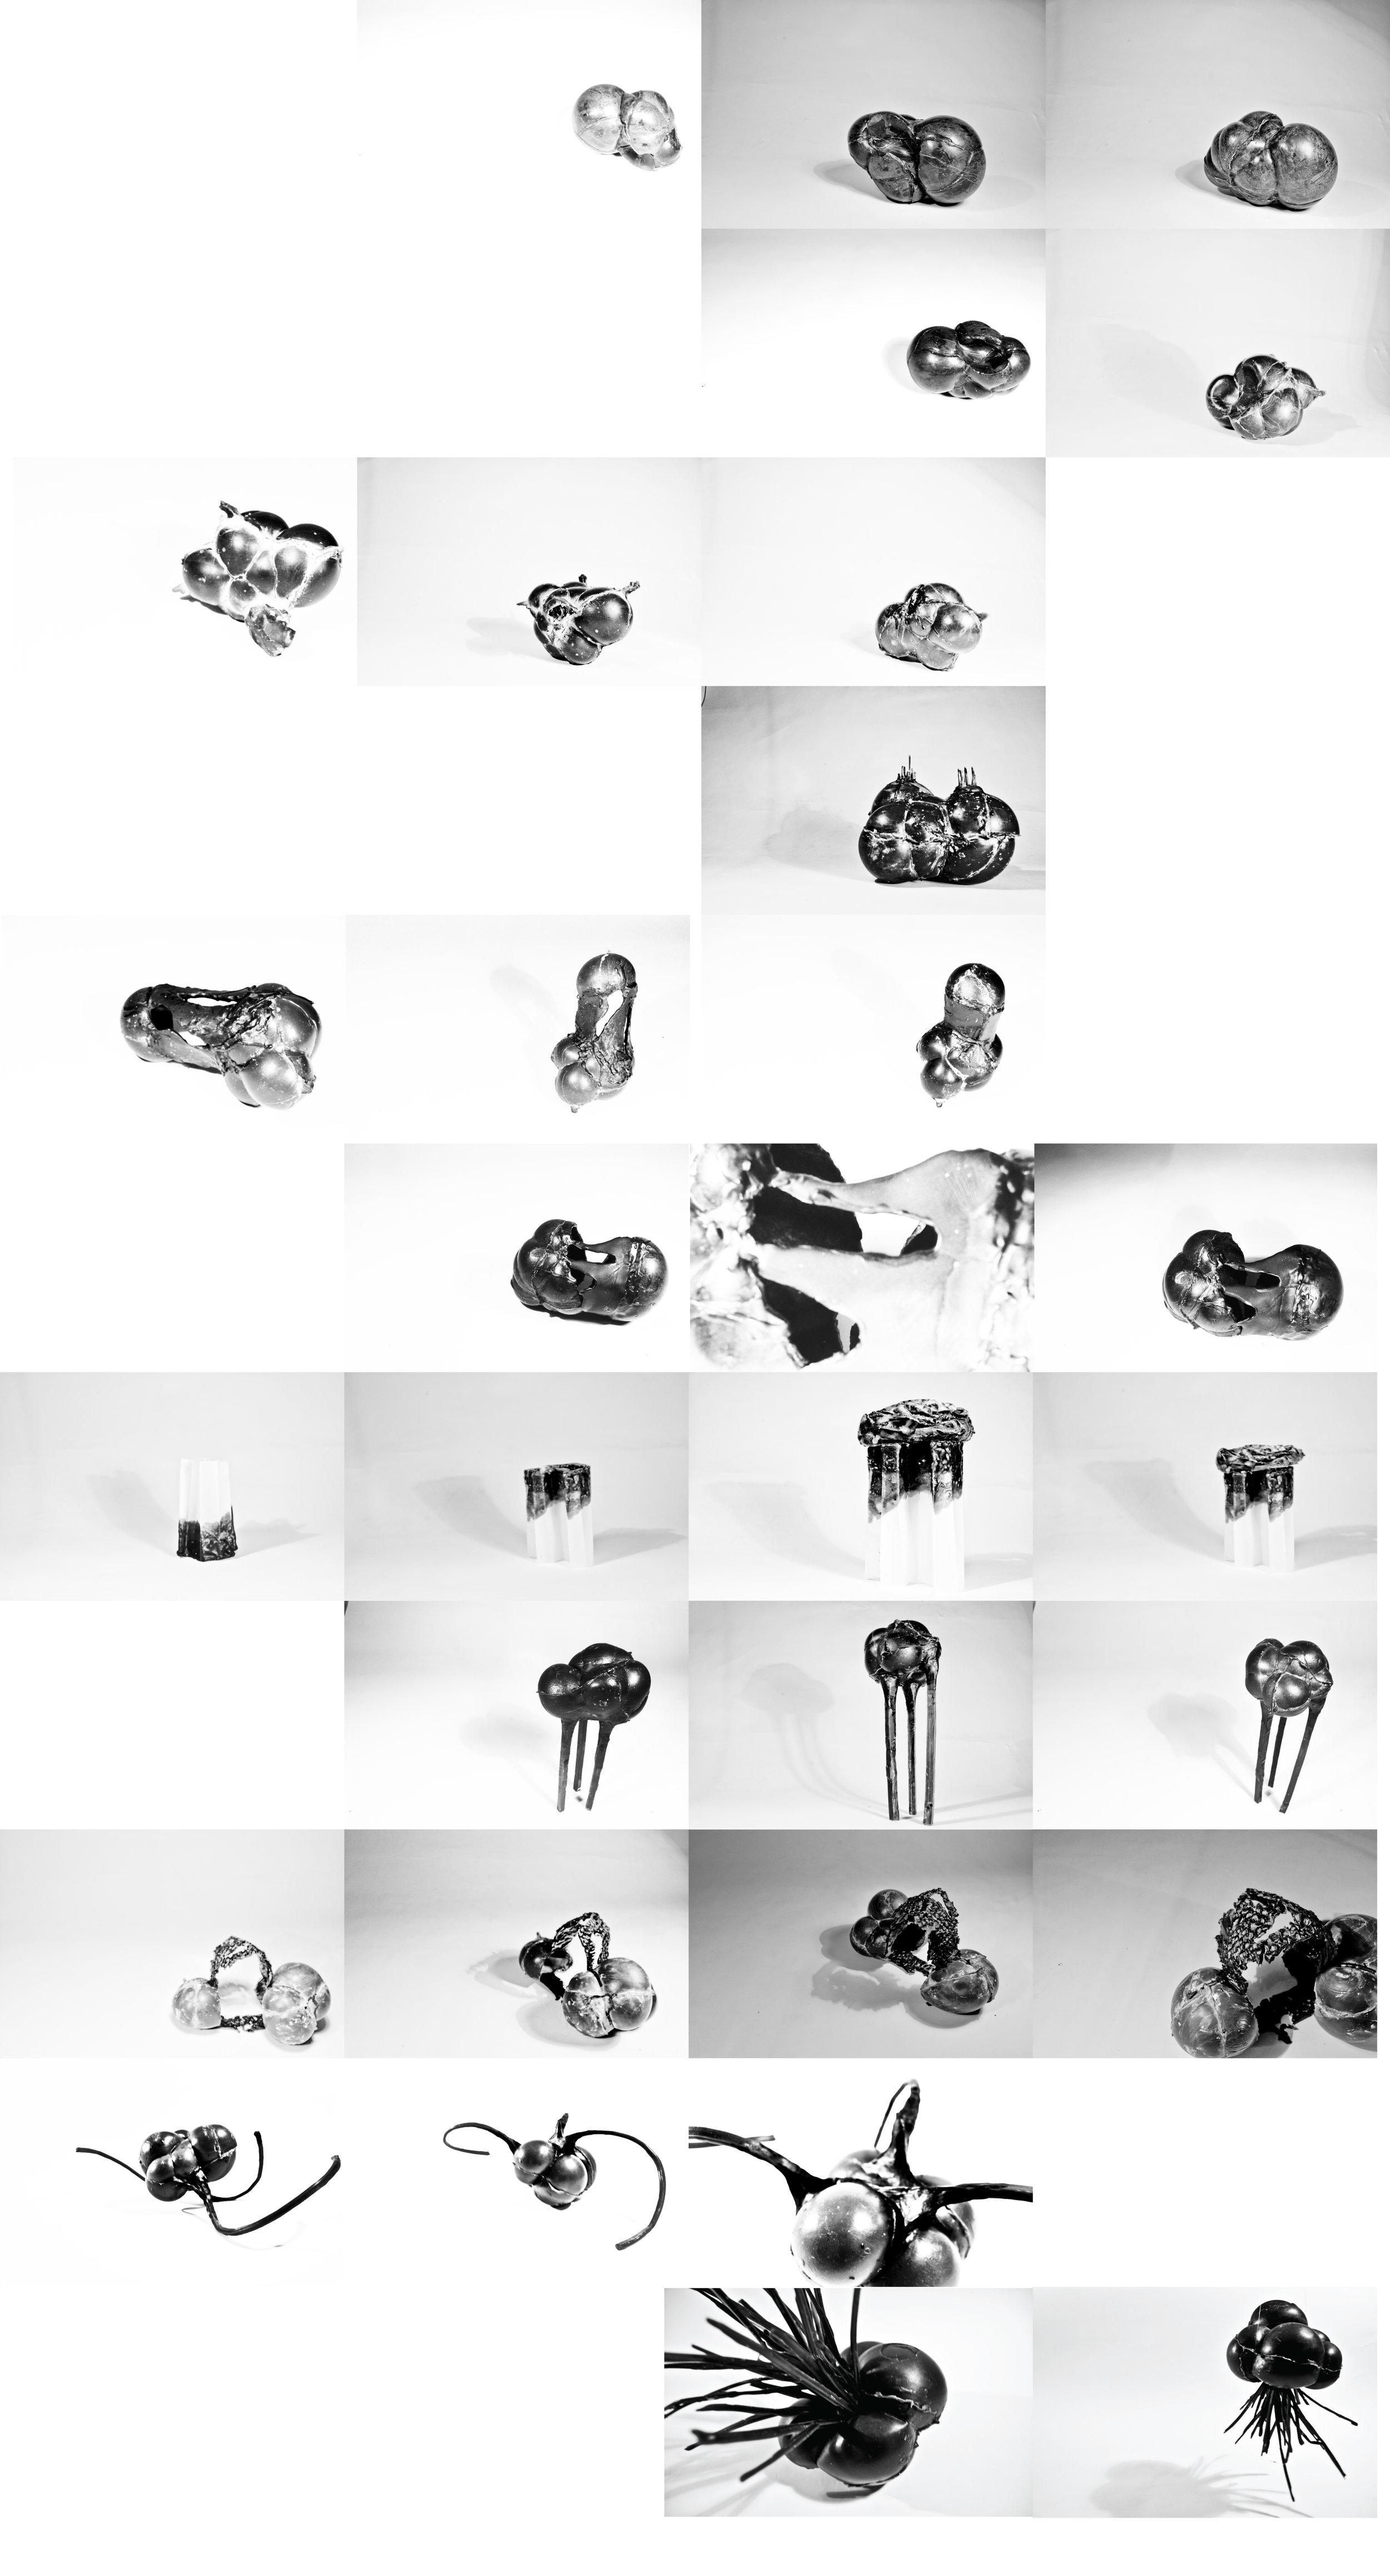 poster_extendinggravity_processphoto.jpg